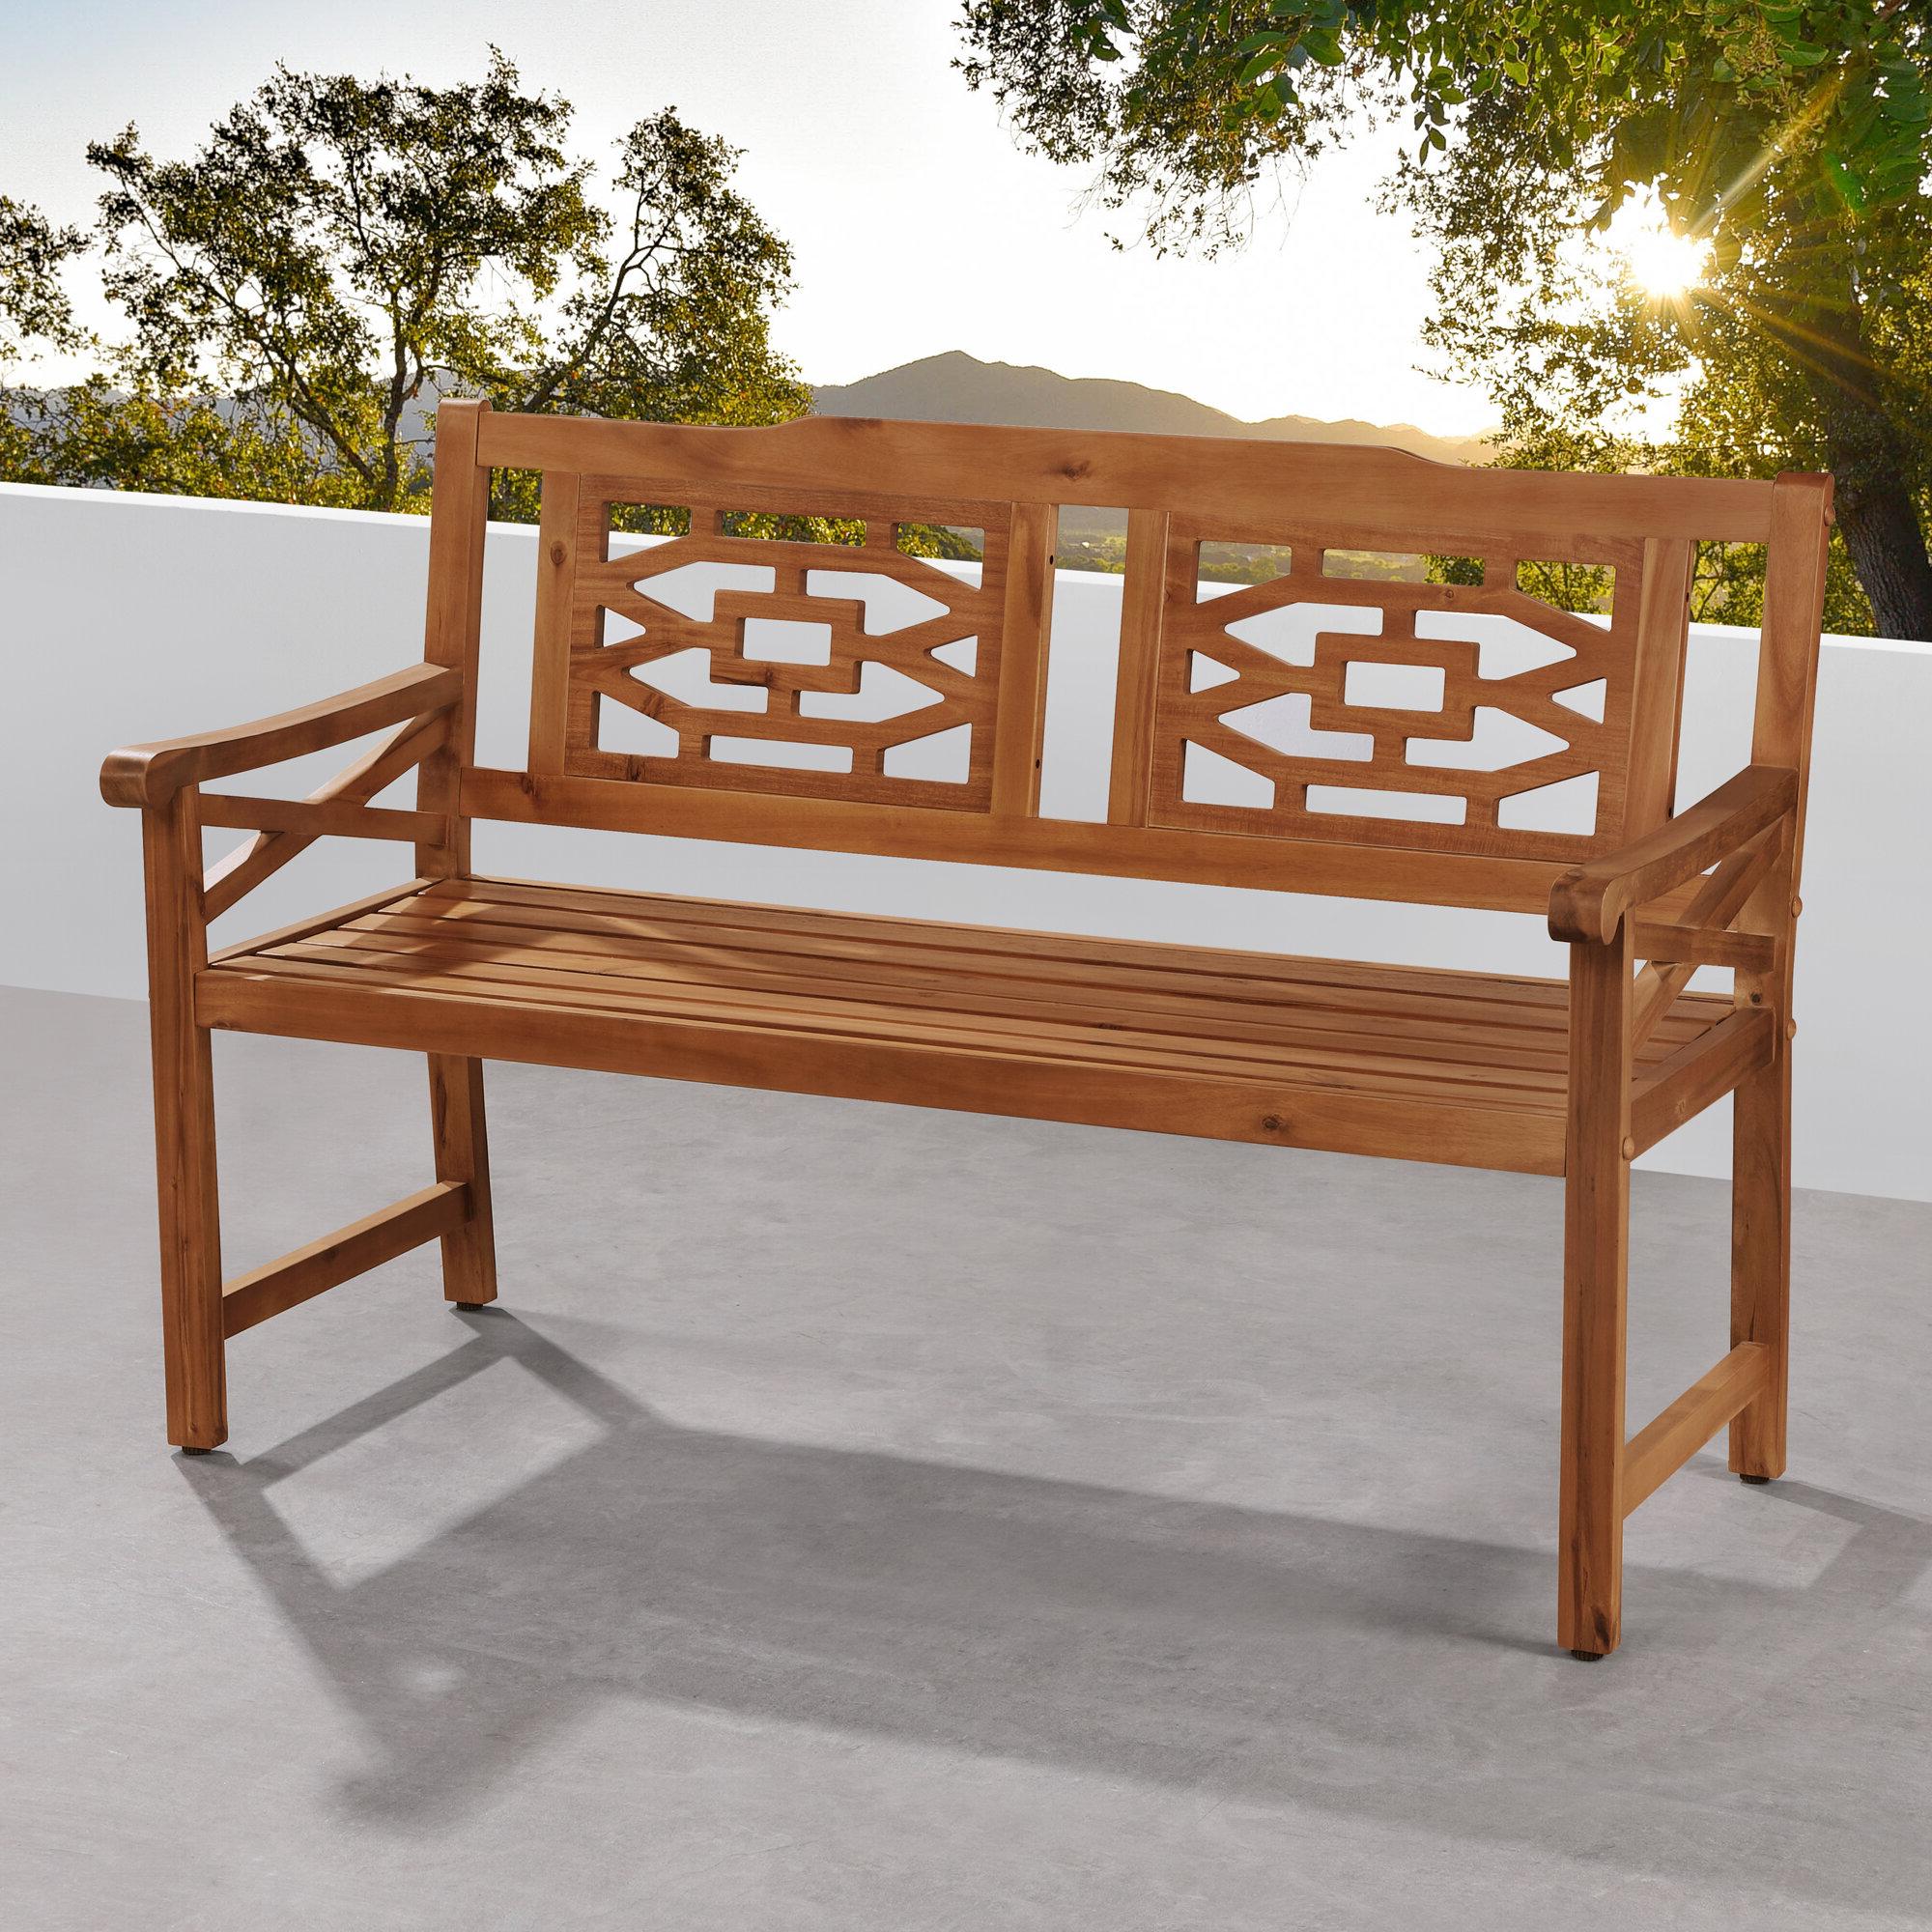 Recent Avoca Wood Garden Benches For Malay Wooden Garden Bench (View 9 of 30)